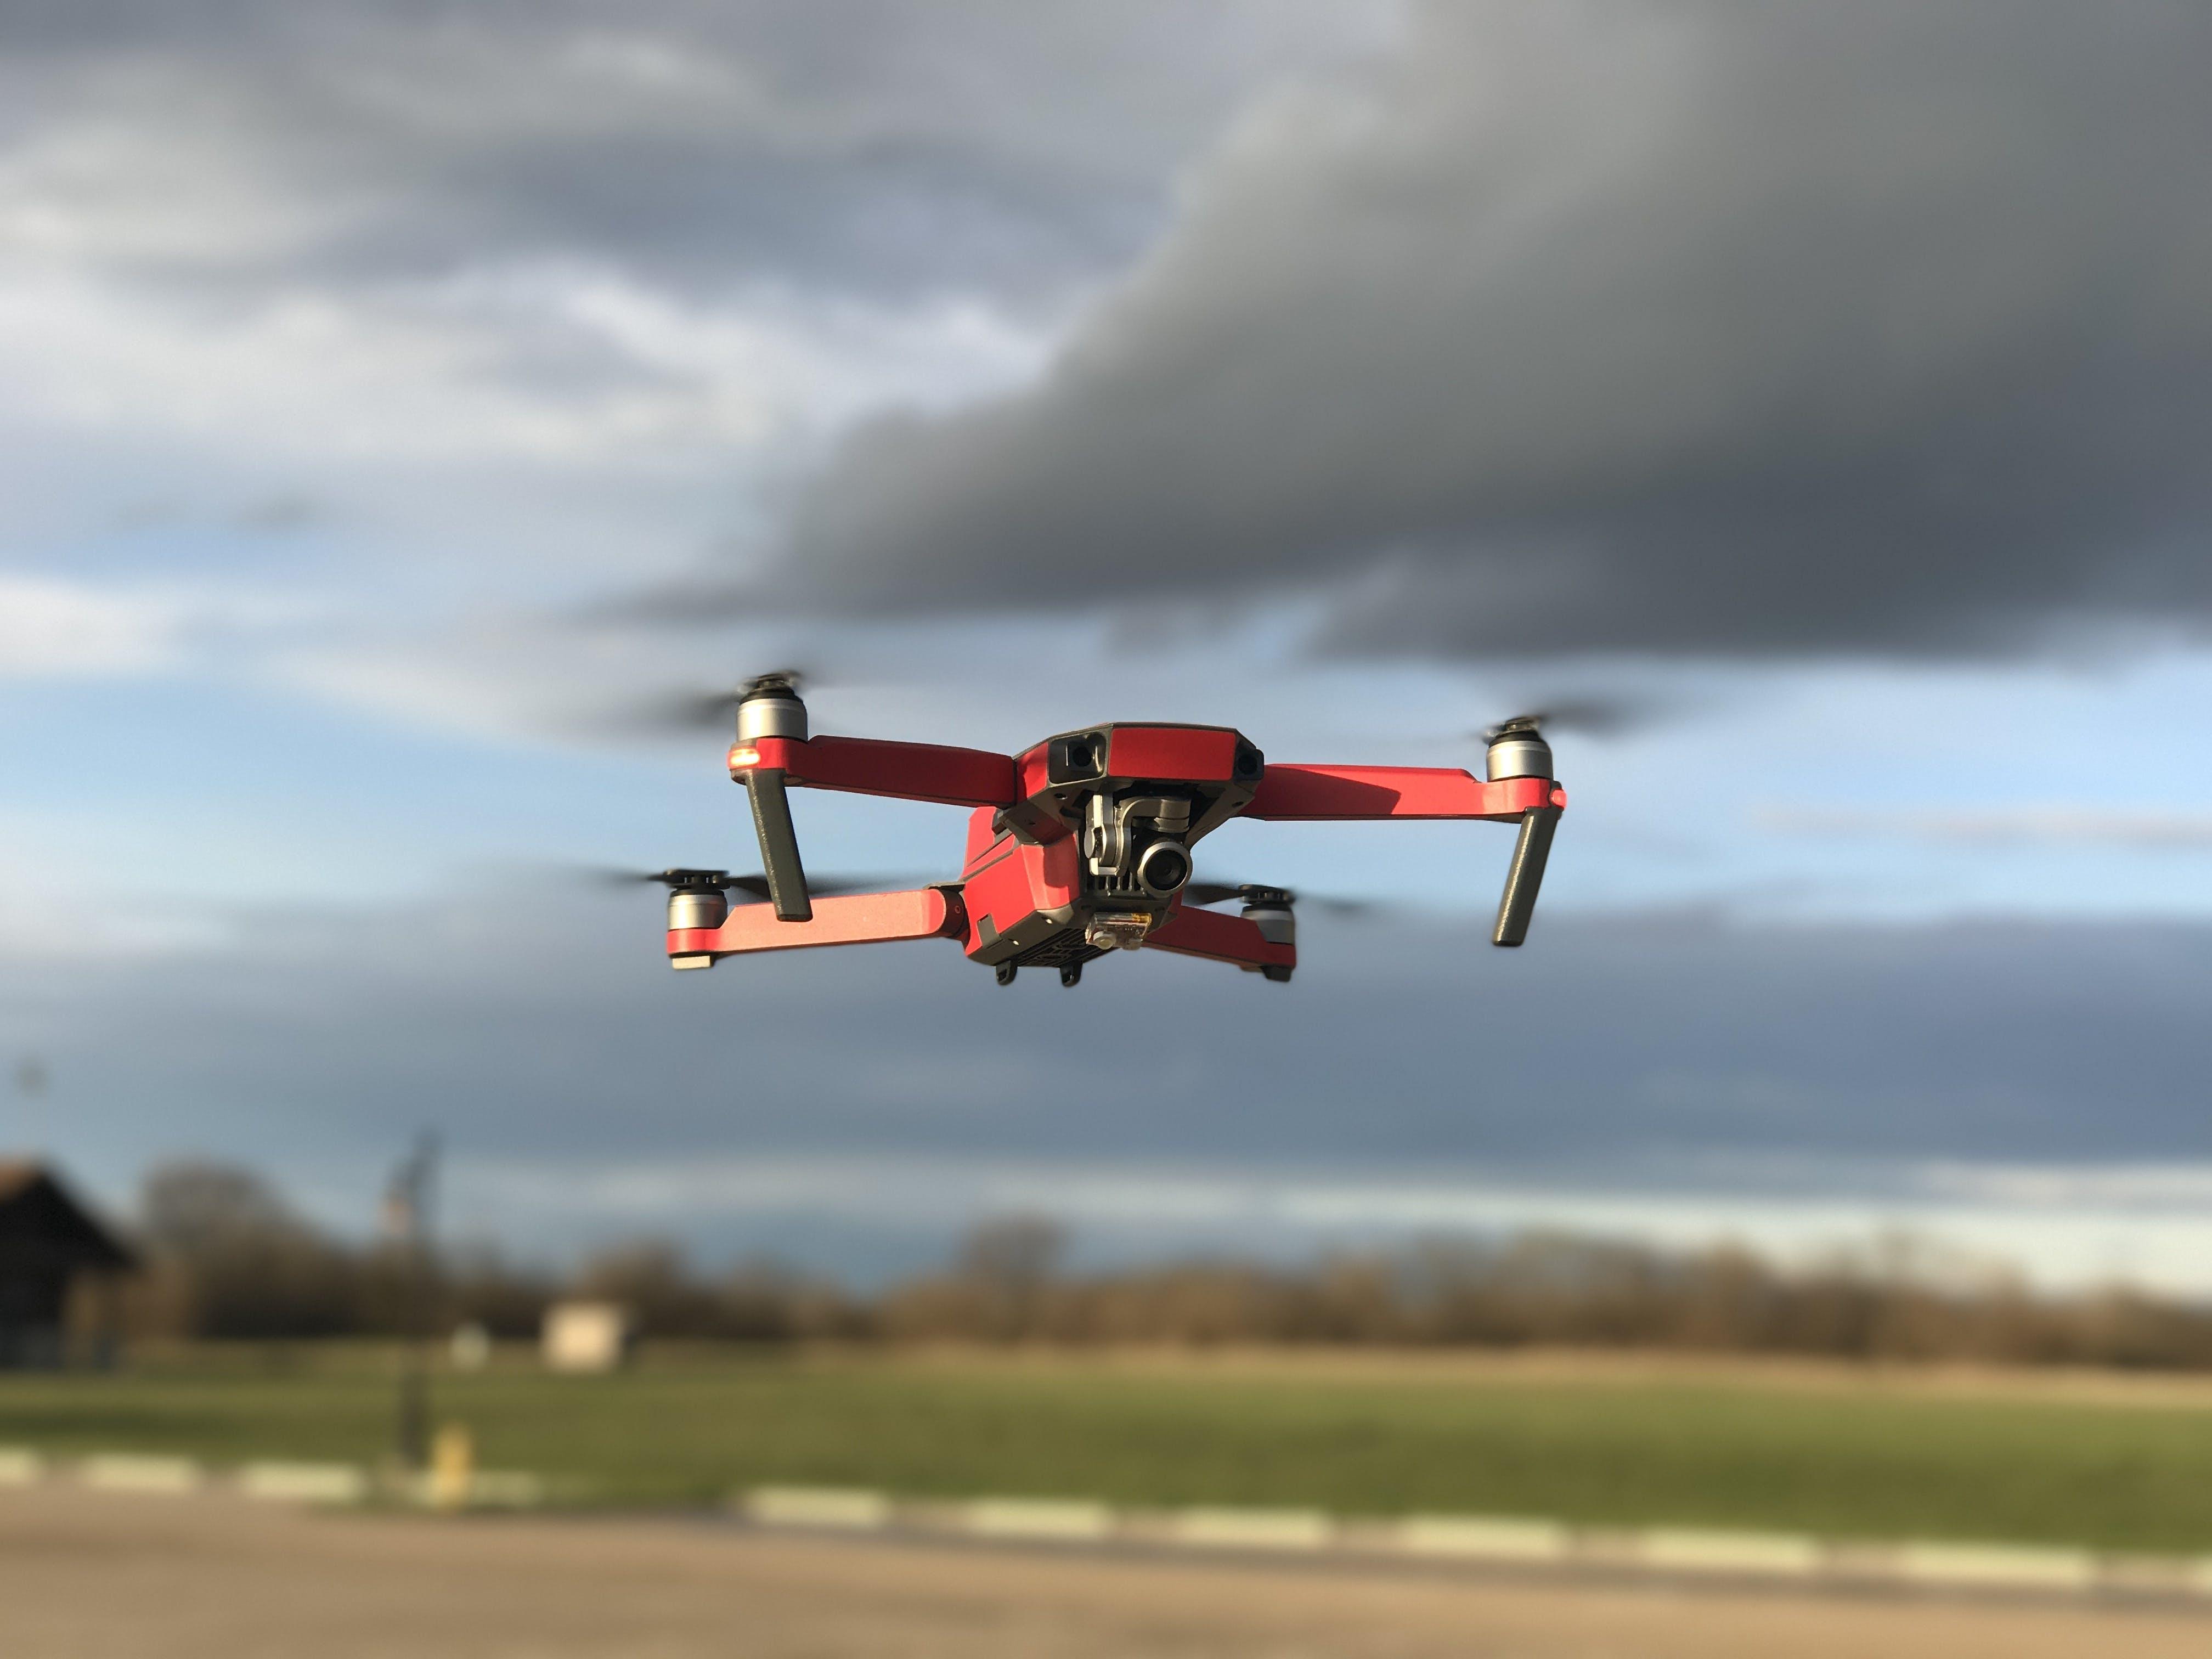 Free stock photo of flight, landscape, sky, flying